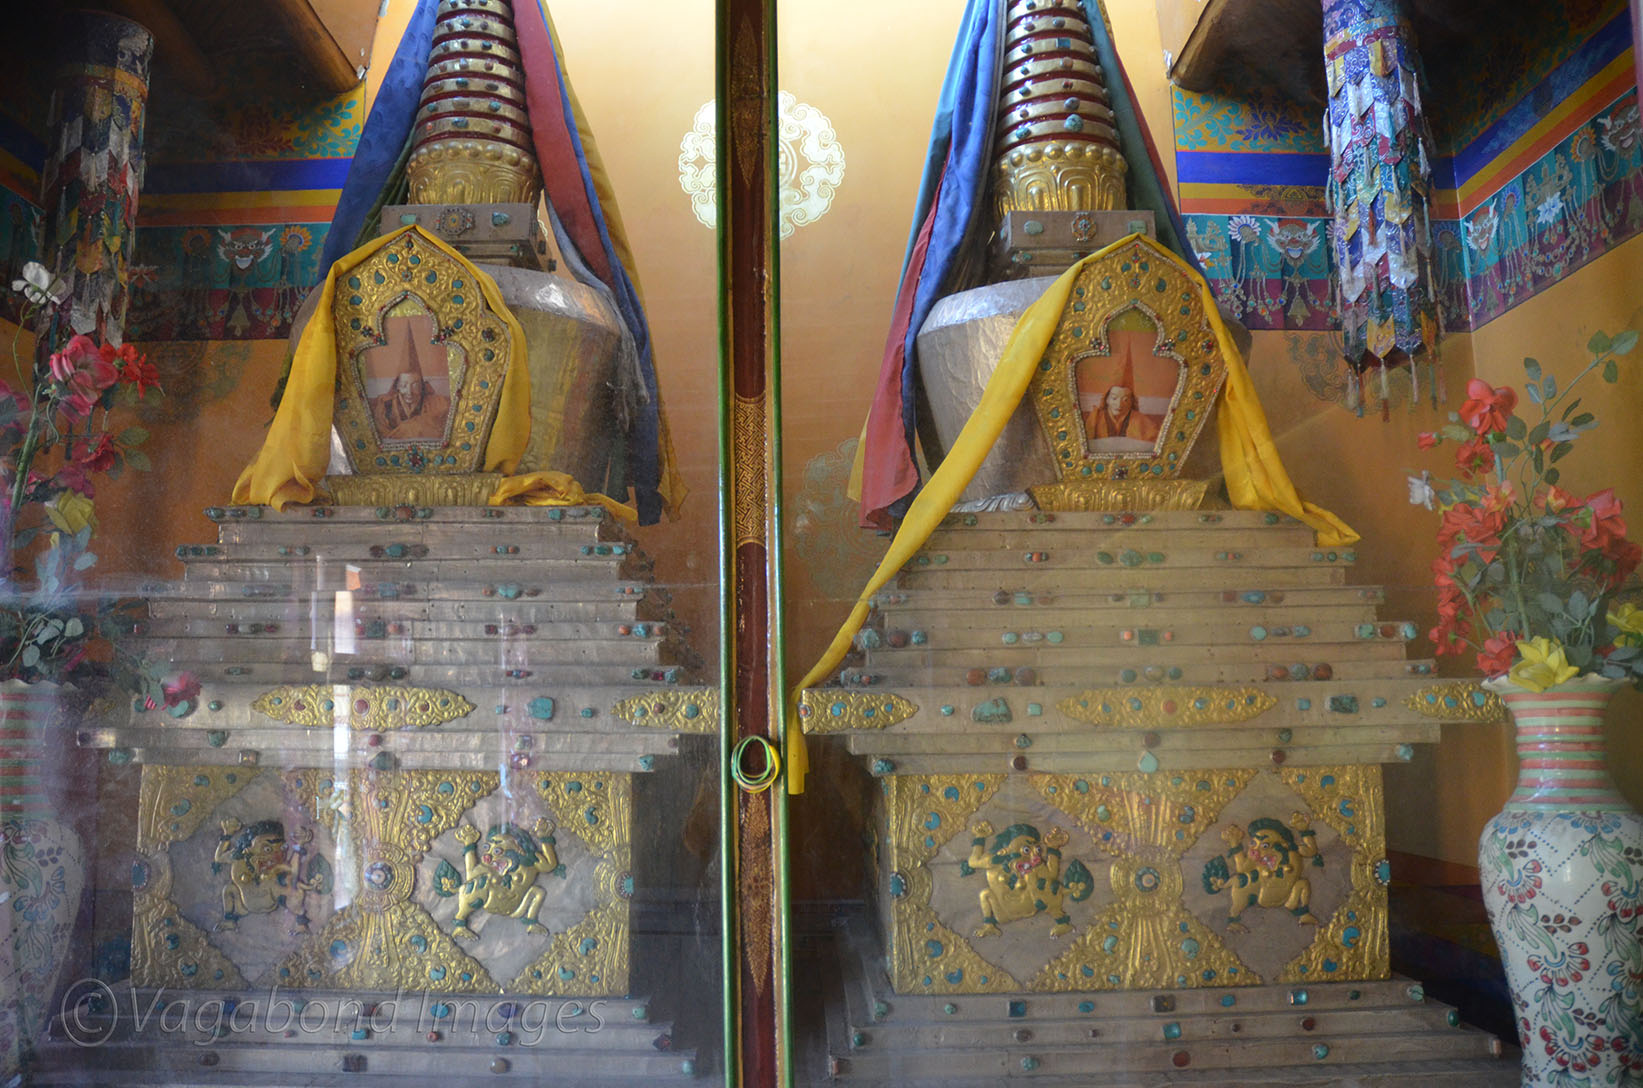 Silver and golden prayer wheels